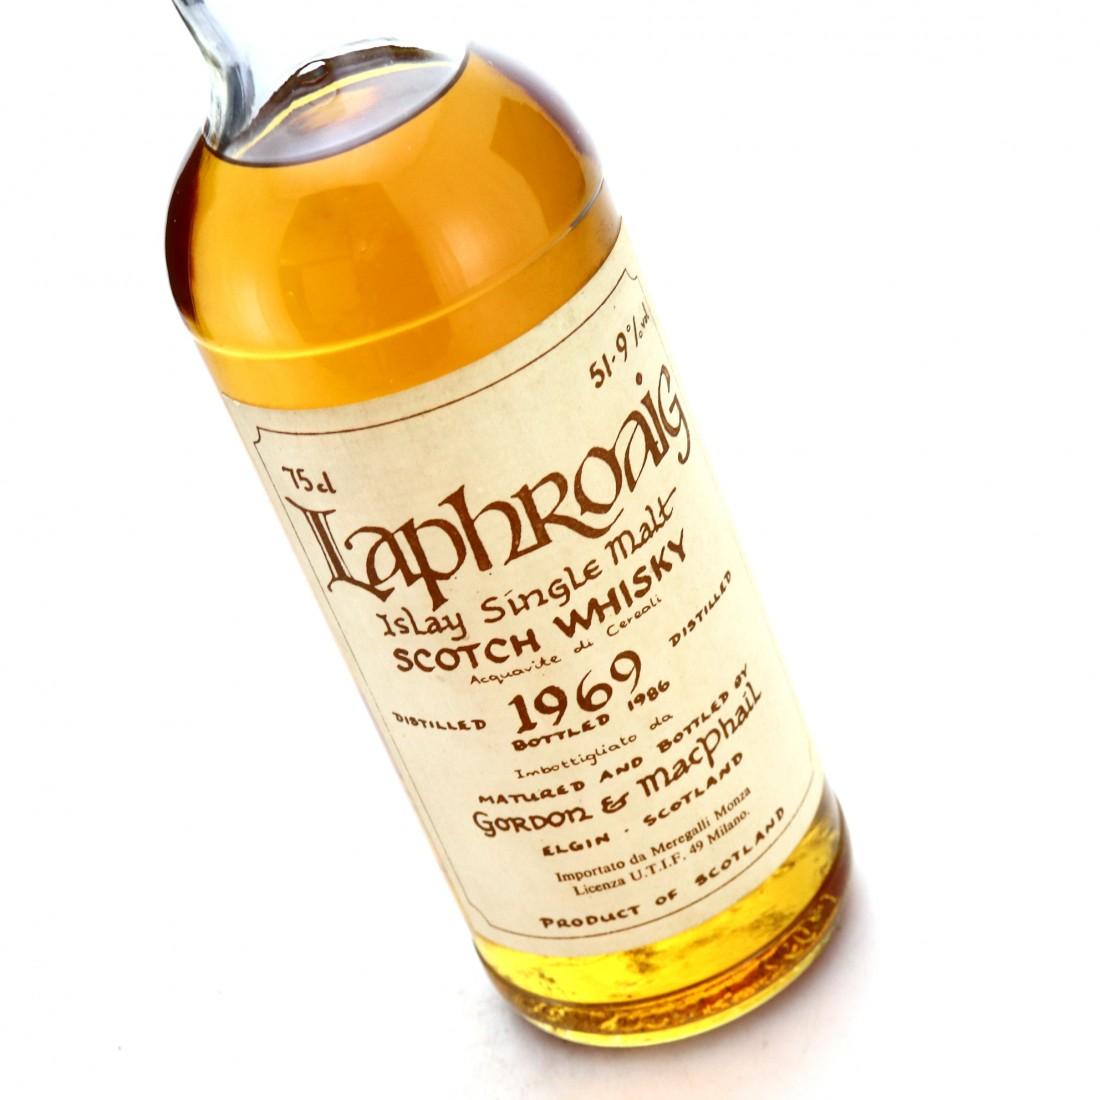 Laphroaig 1969 Gordon and MacPhail Cask Strength Celtic Label / Meregalli Import